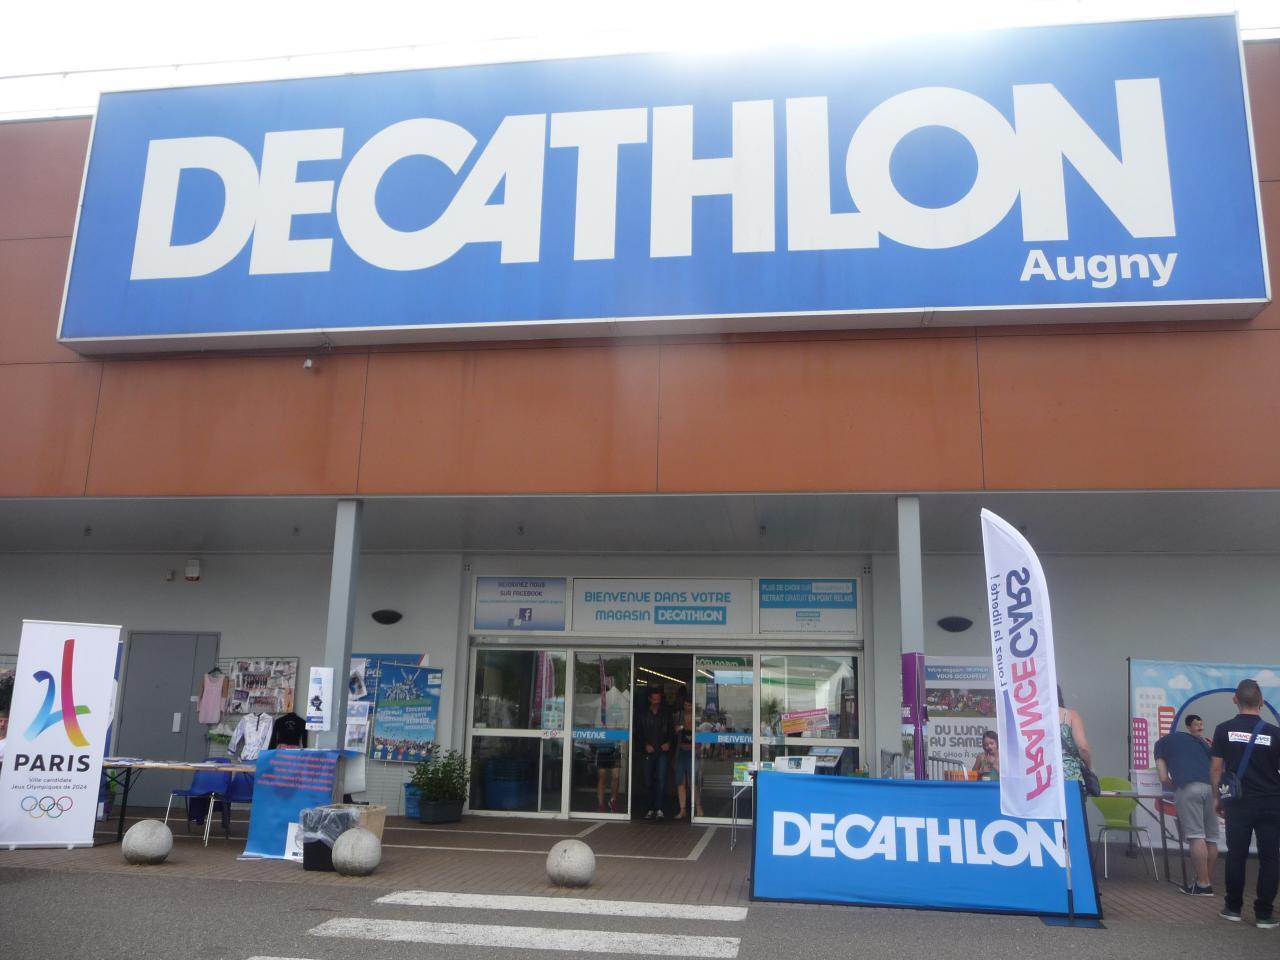 PARTENAIRE EXPOSANT VITALSPORT DECATHLON  METZ AUGNY 57